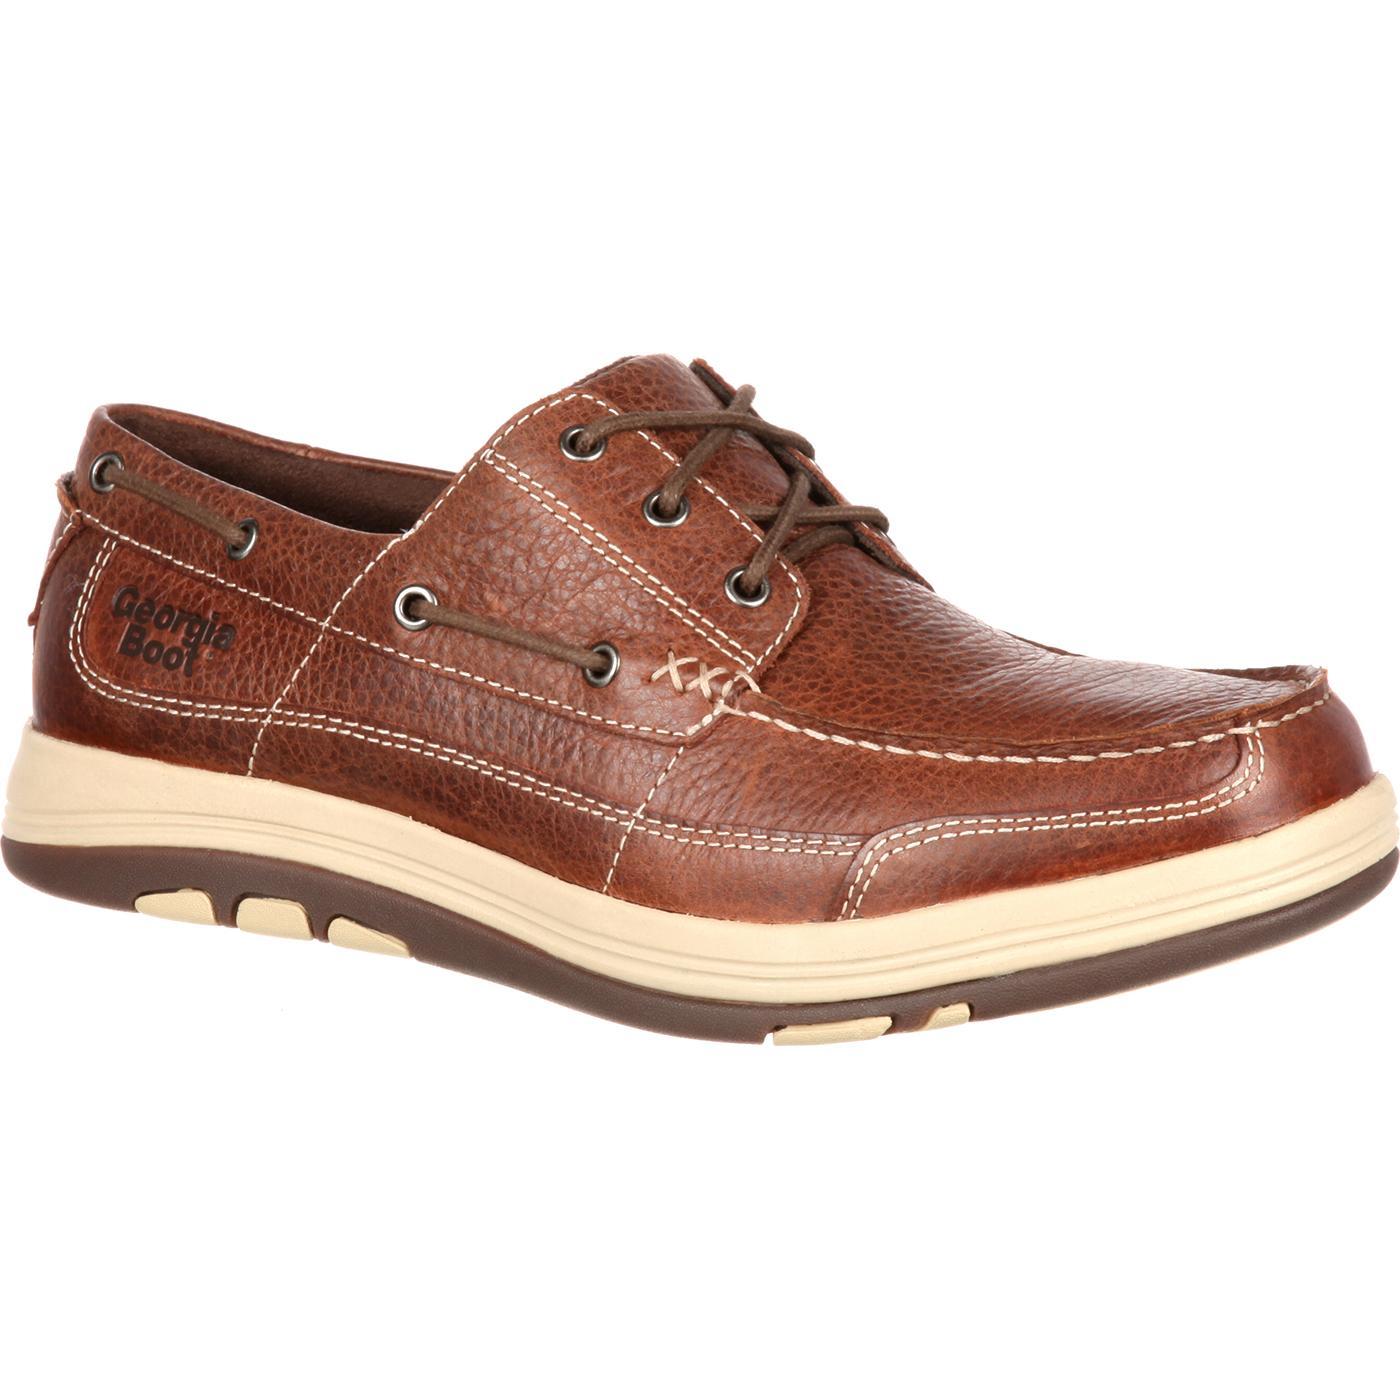 Comfortable Steel Toe Work Boots - Yu Boots